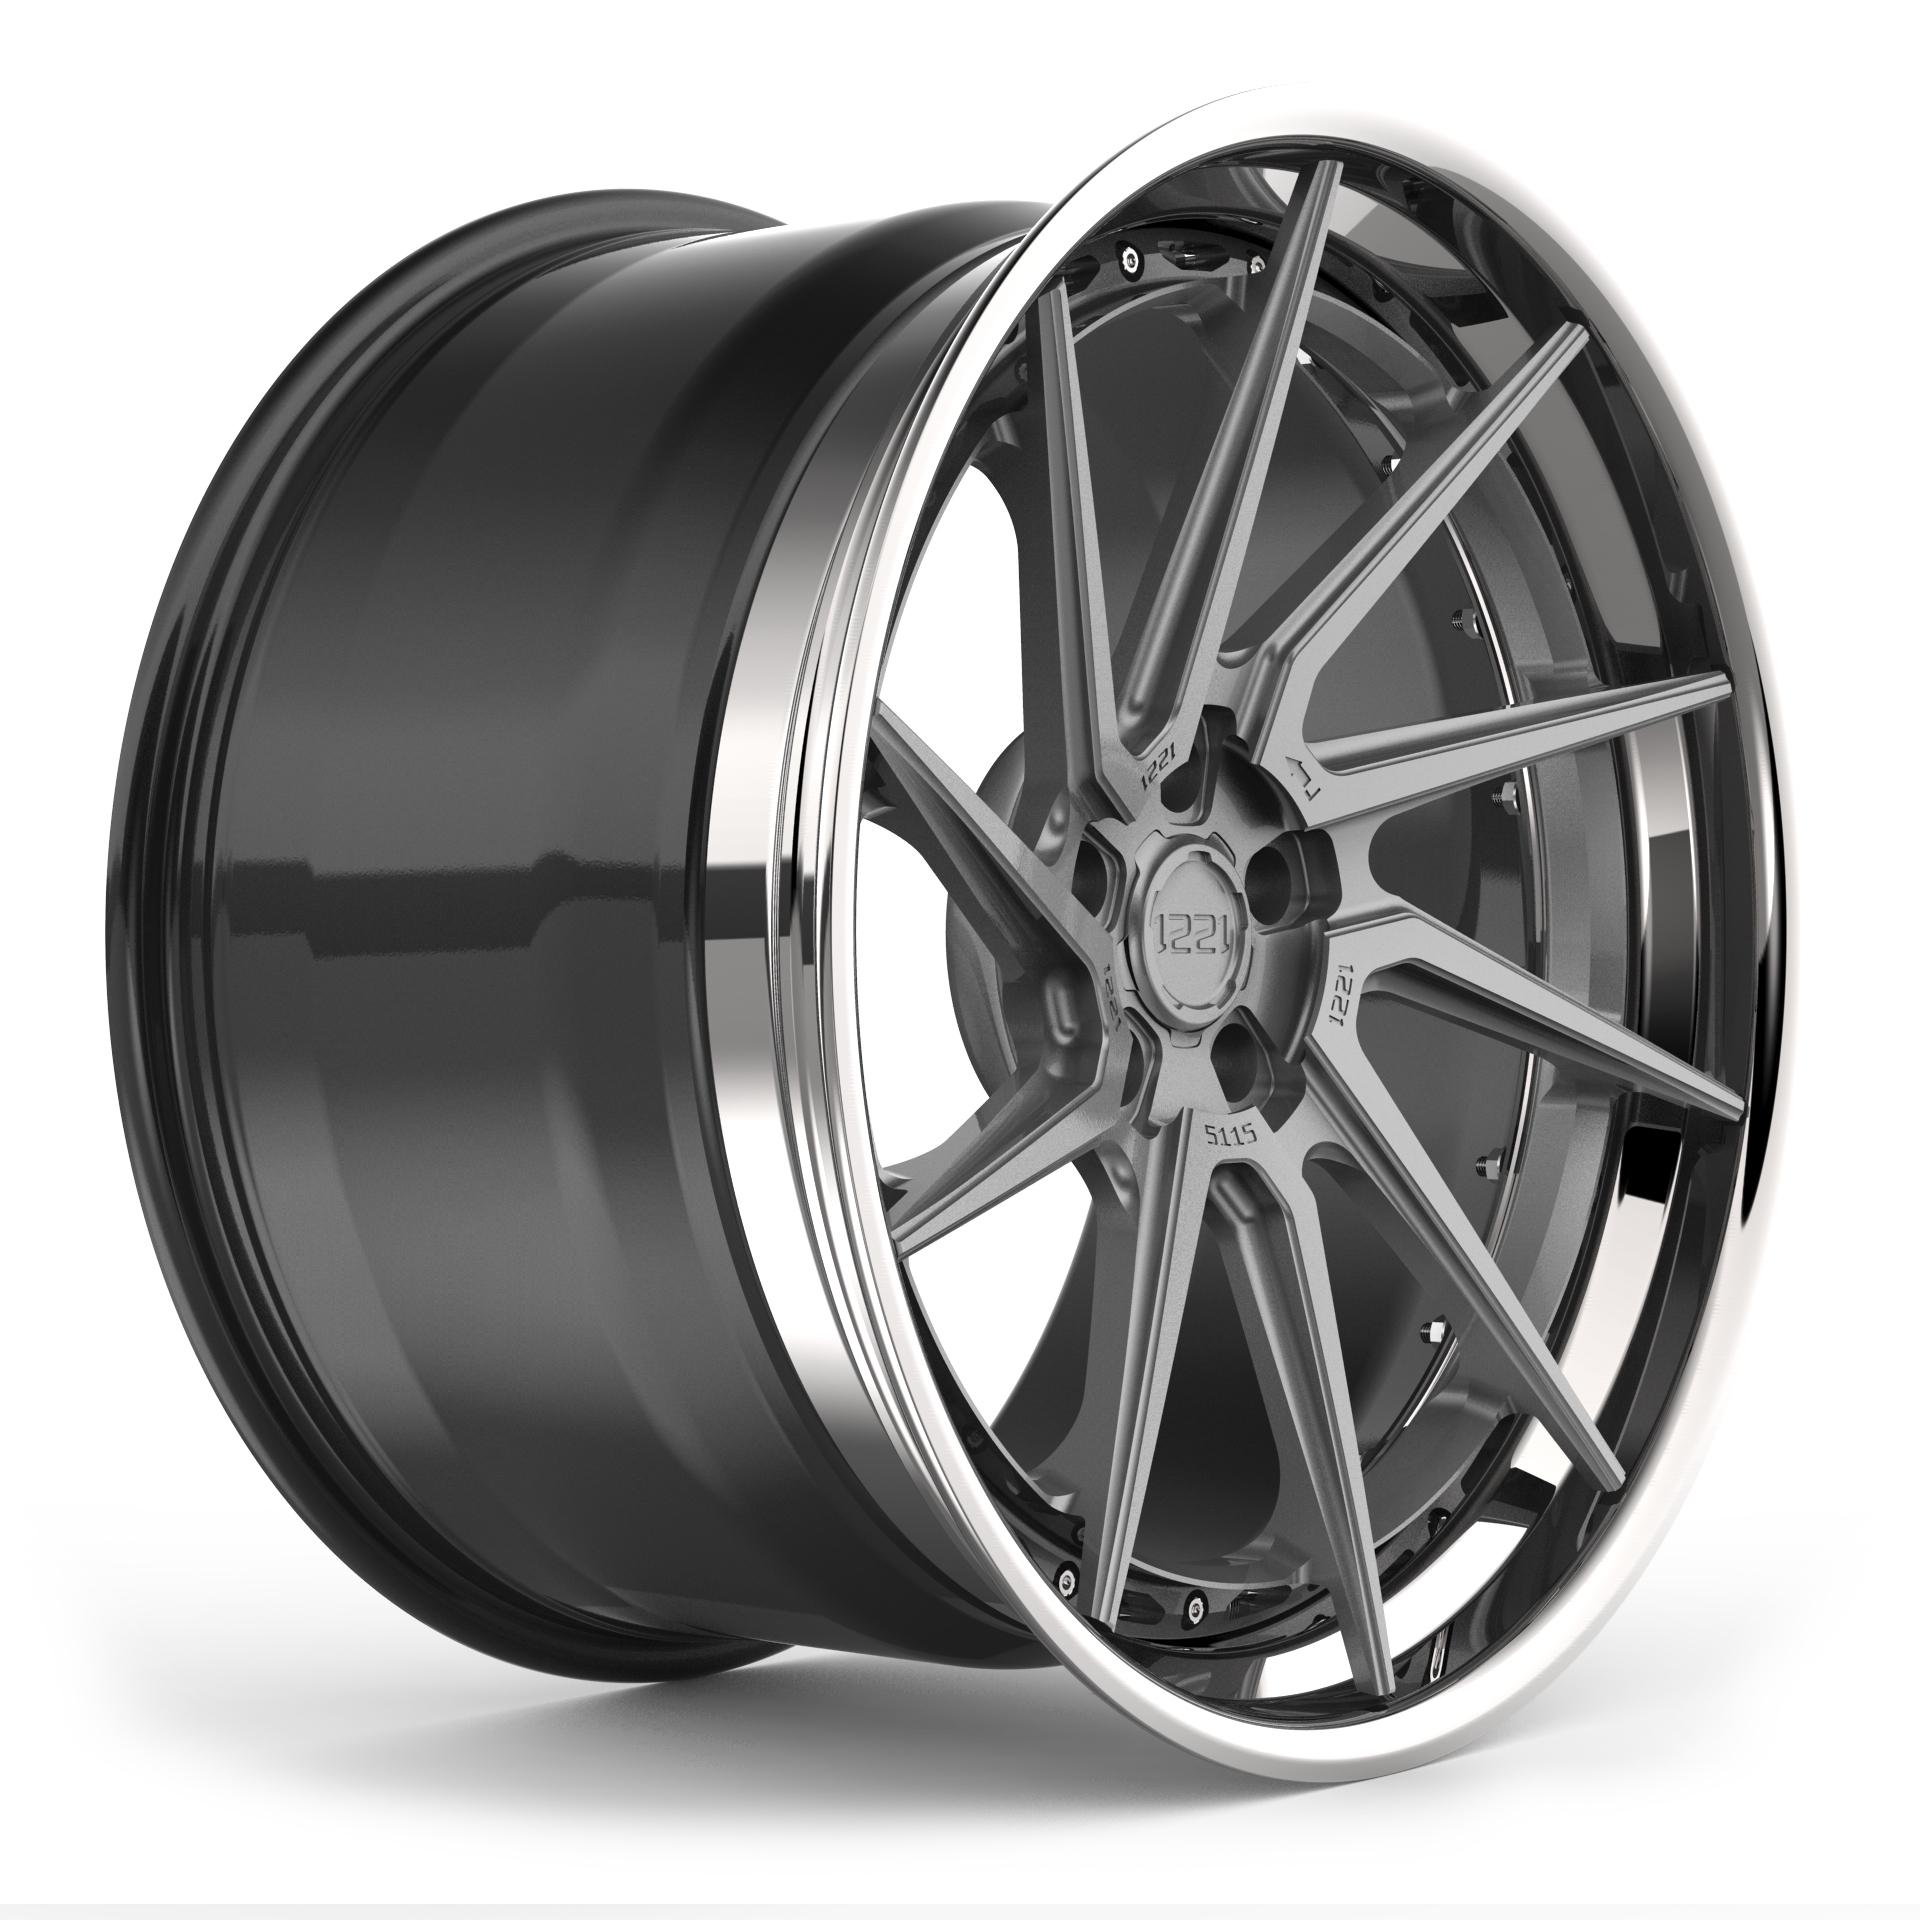 1221 Wheels R5115 AP3LX APEX3.0 forged wheels